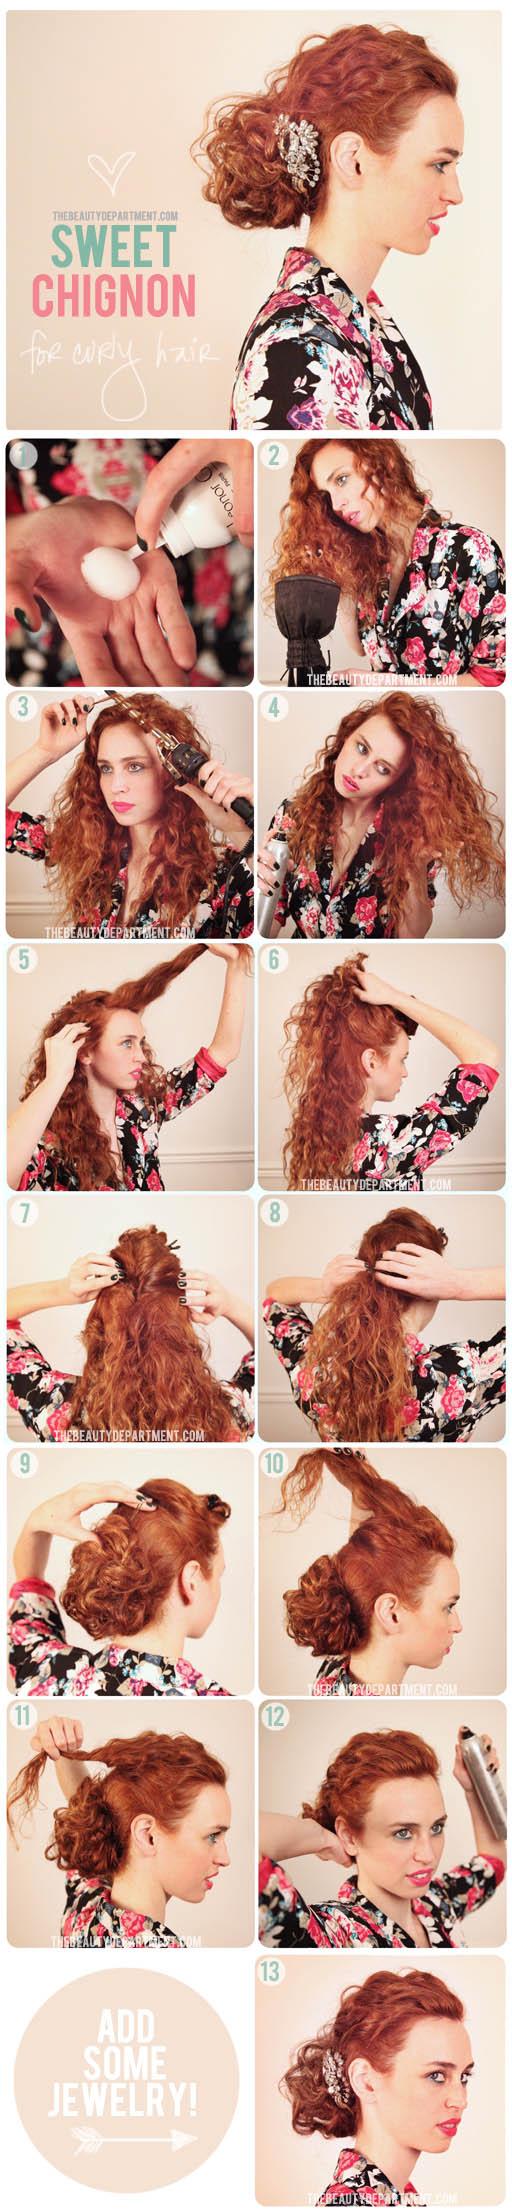 Tutorial acconciature capelli ricci medi